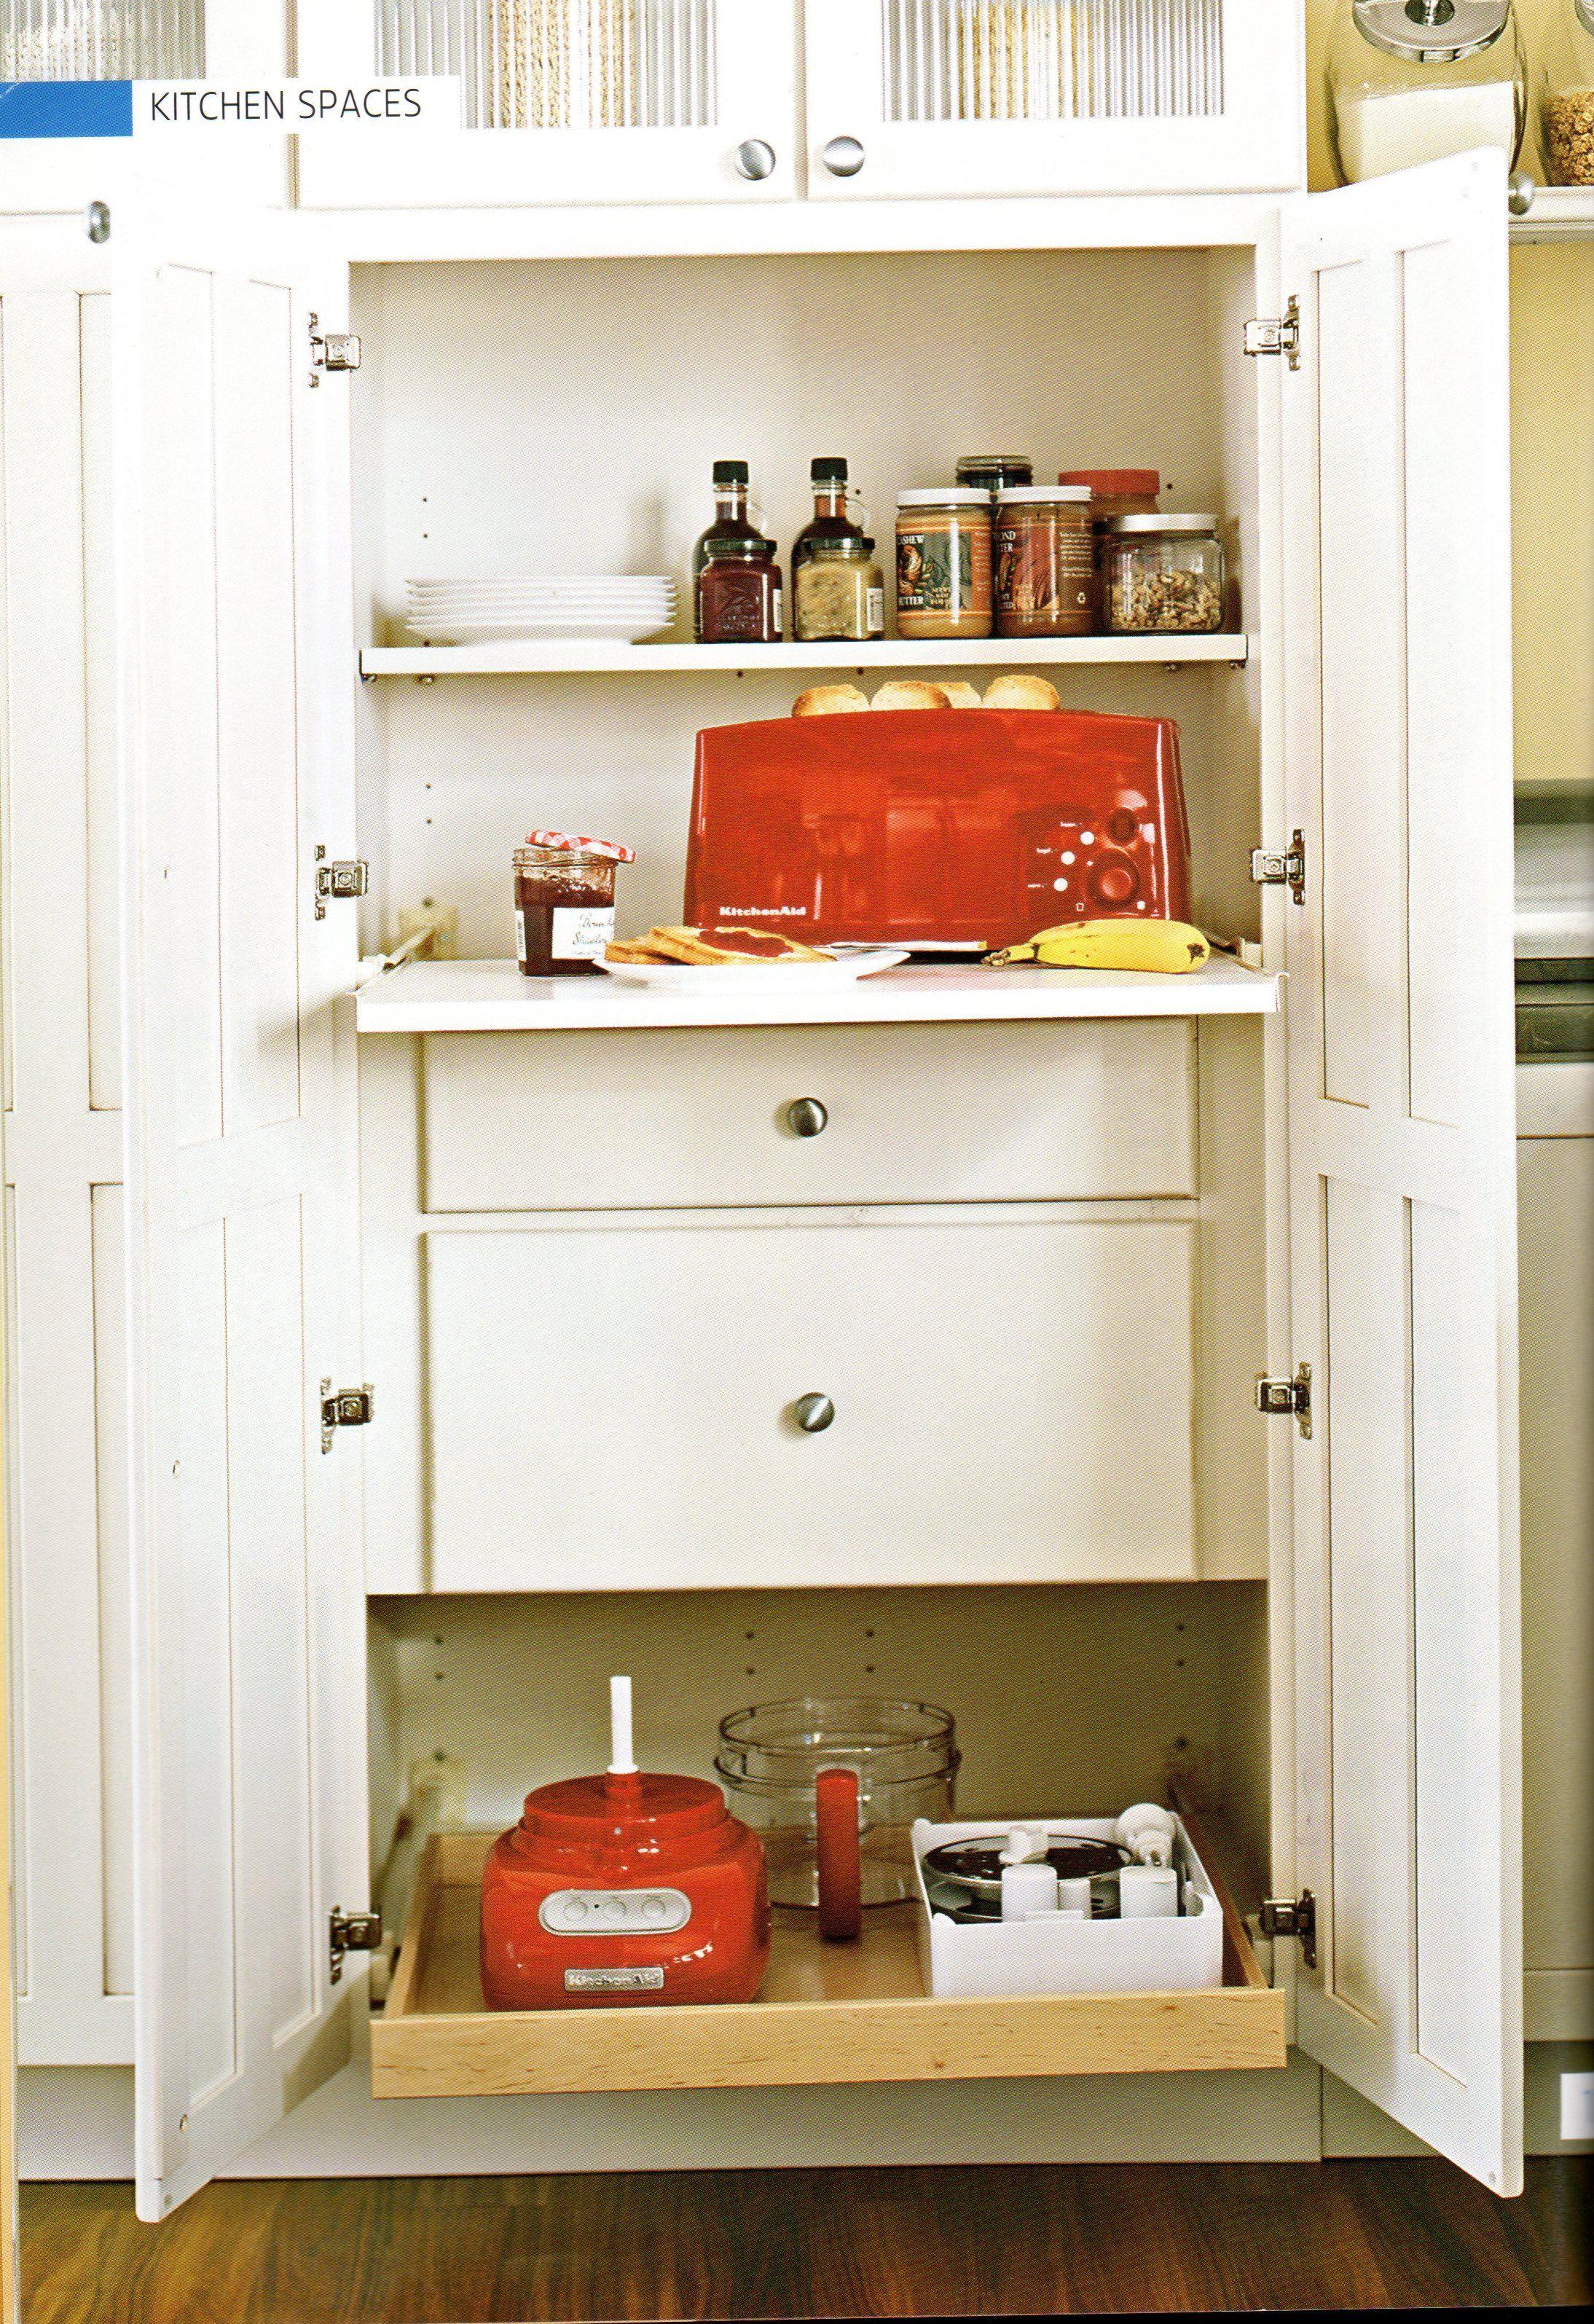 hidden appliances outdoor kitchen appliances outdoor kitchen design outdoor kitchen on outdoor kitchen appliances id=64234